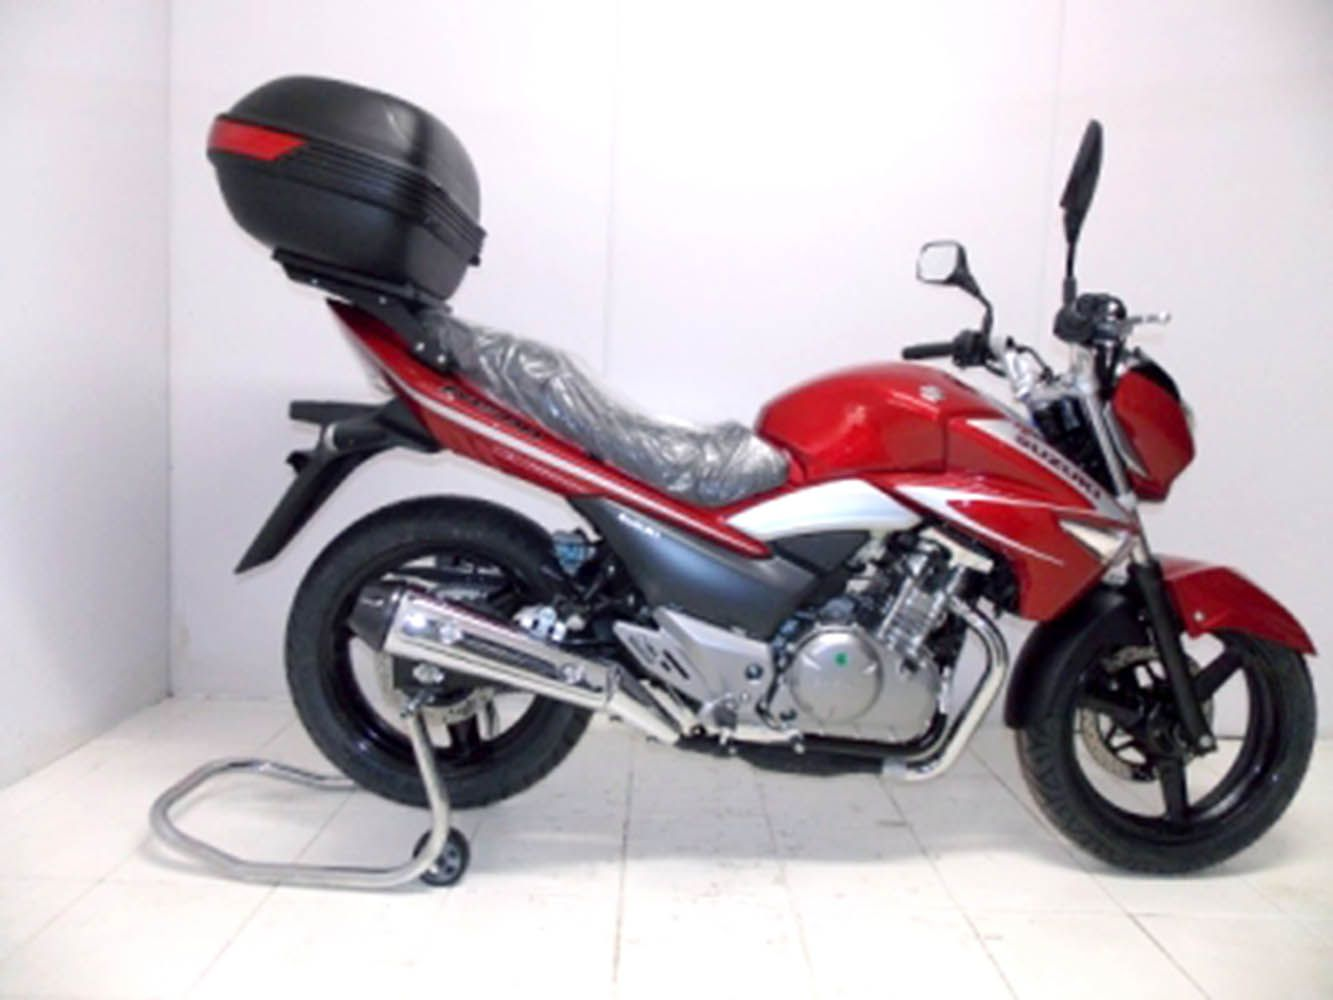 Bagageiro Chapa Bau Rack Suzuki Inazuma 250 Chapam 9553